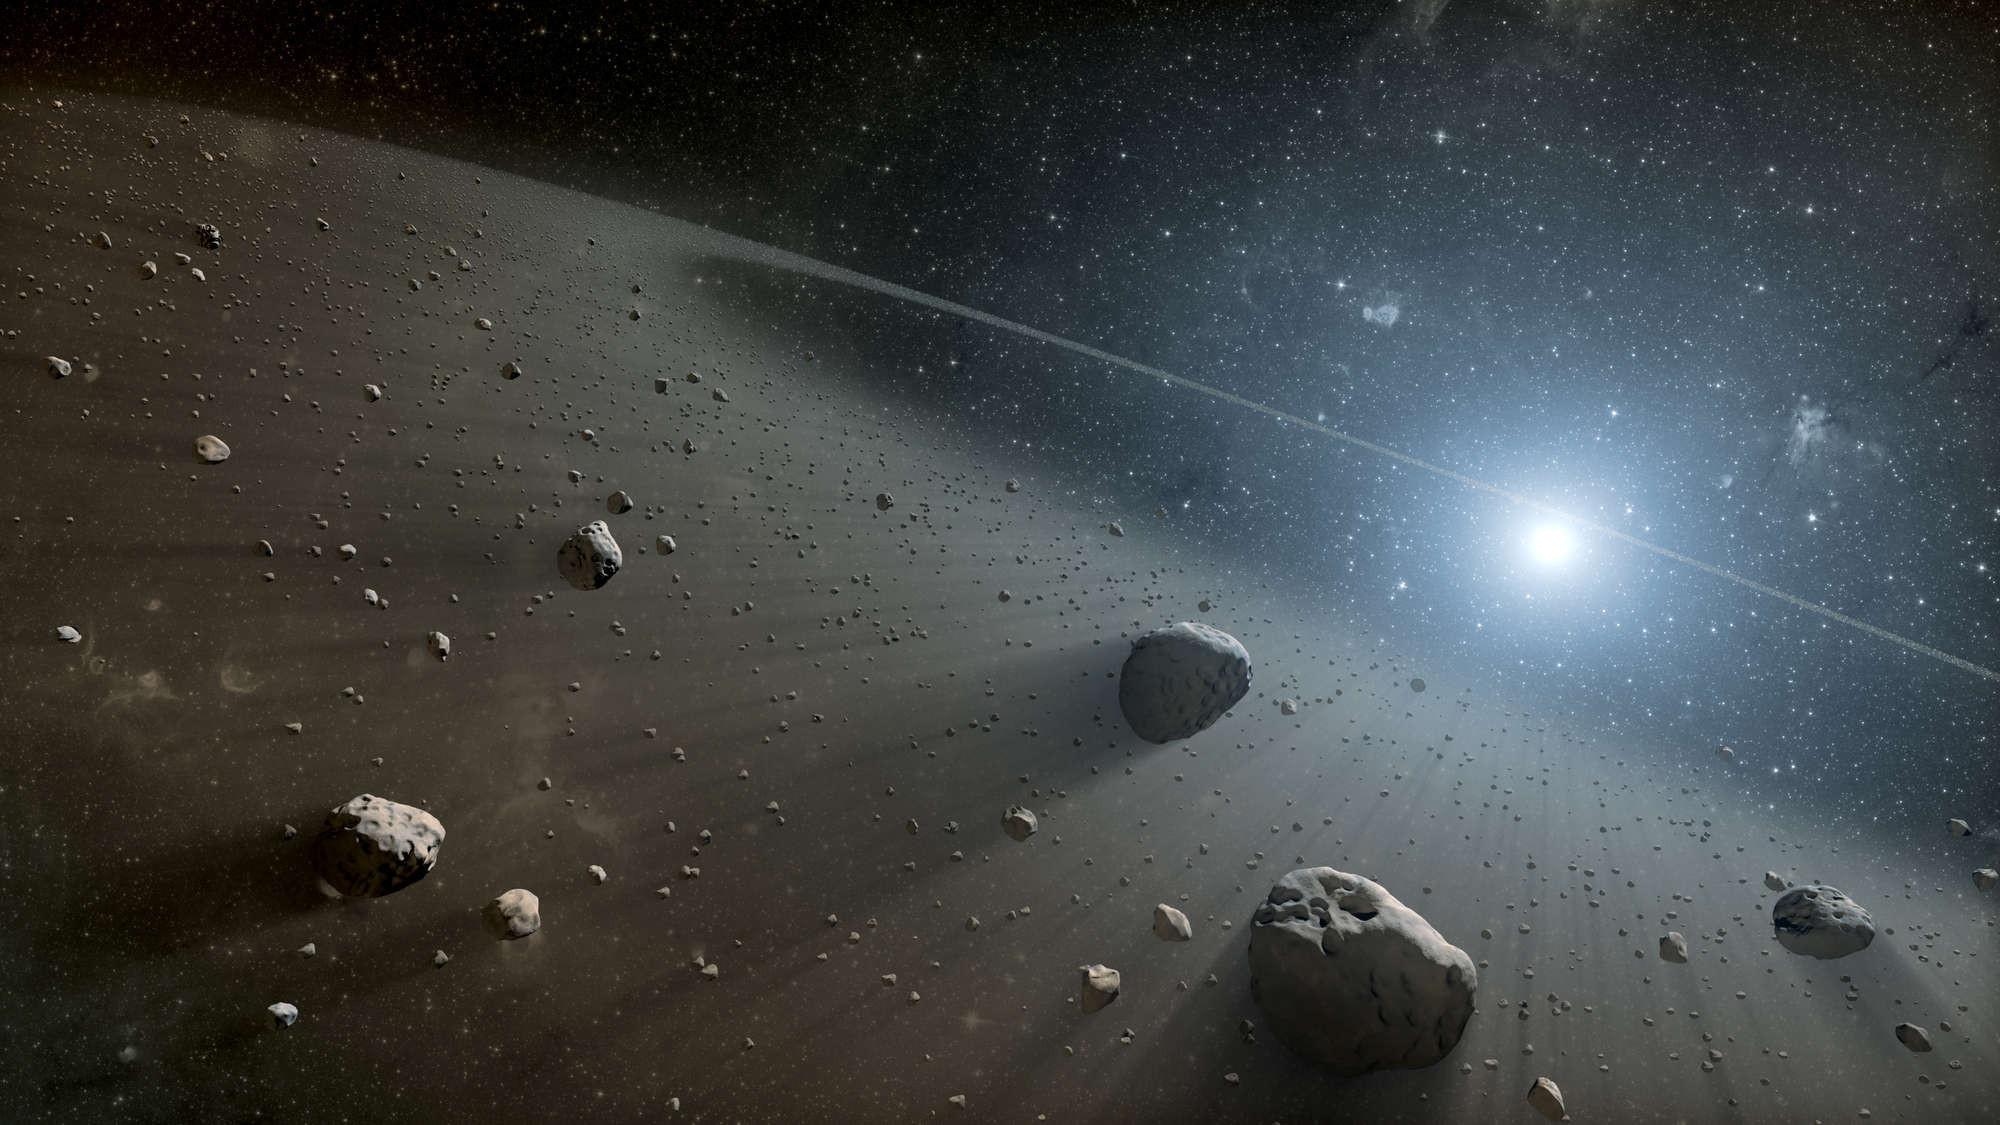 Астроном: «звезда пришельцев» KIC 8462852 опять начала загадочно тускнеть